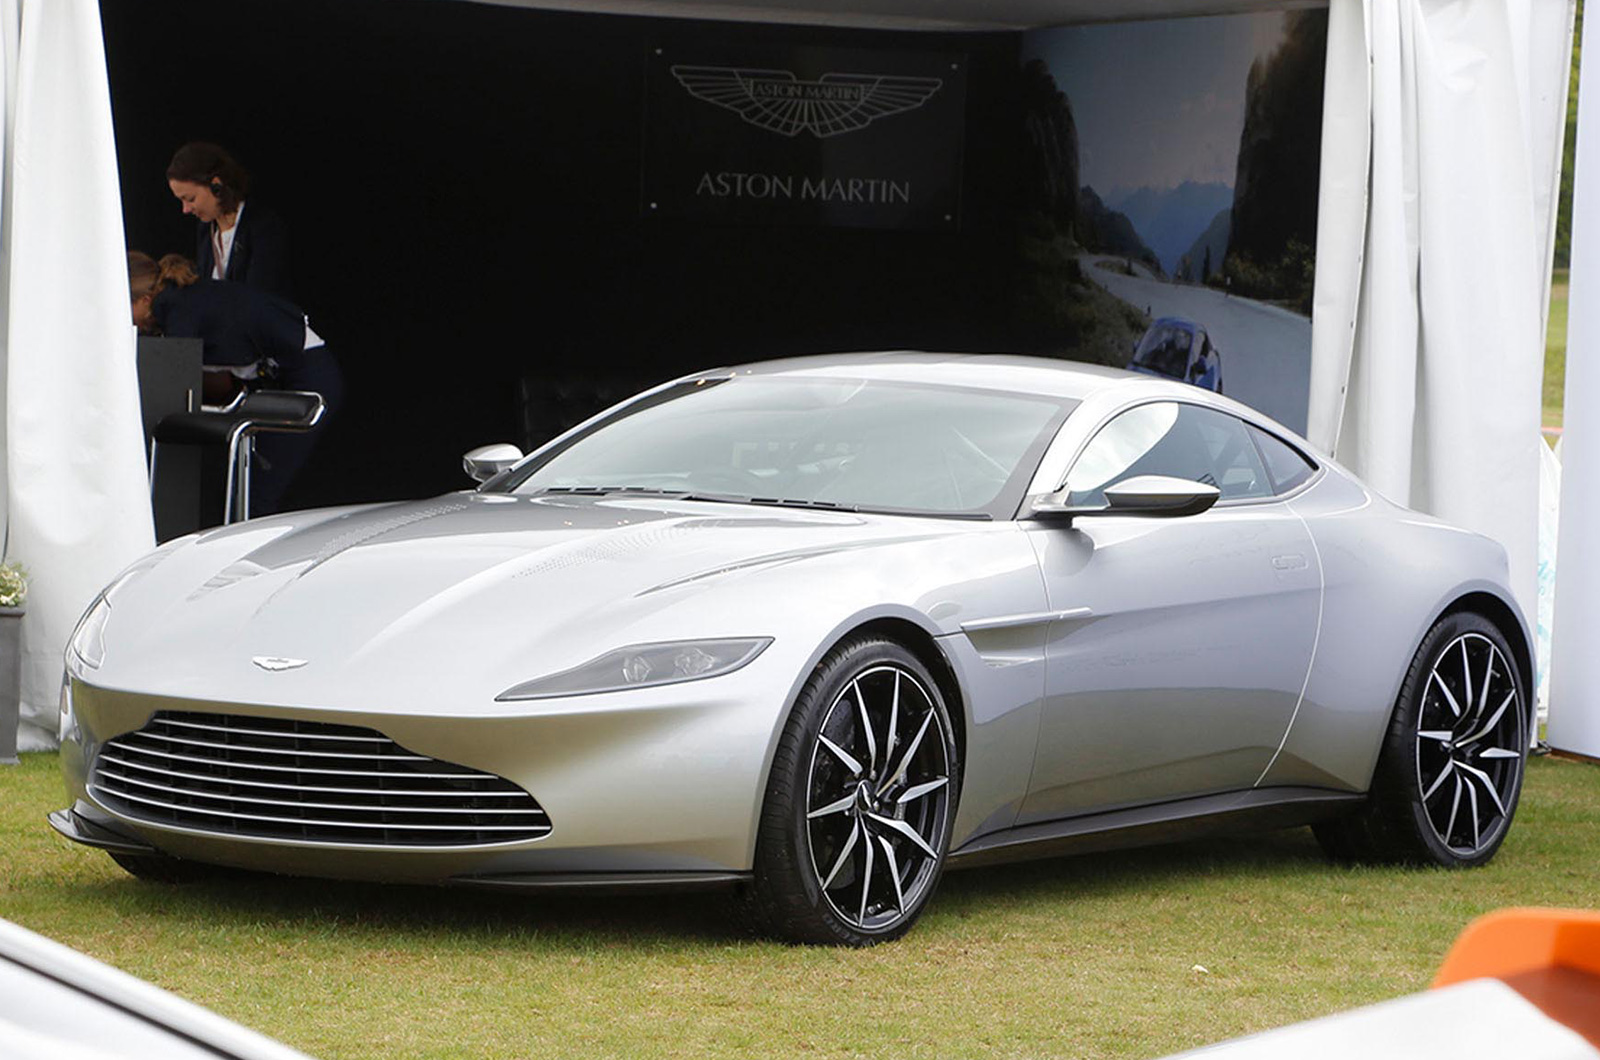 vehicles bond lifestyle - HD1600×1060